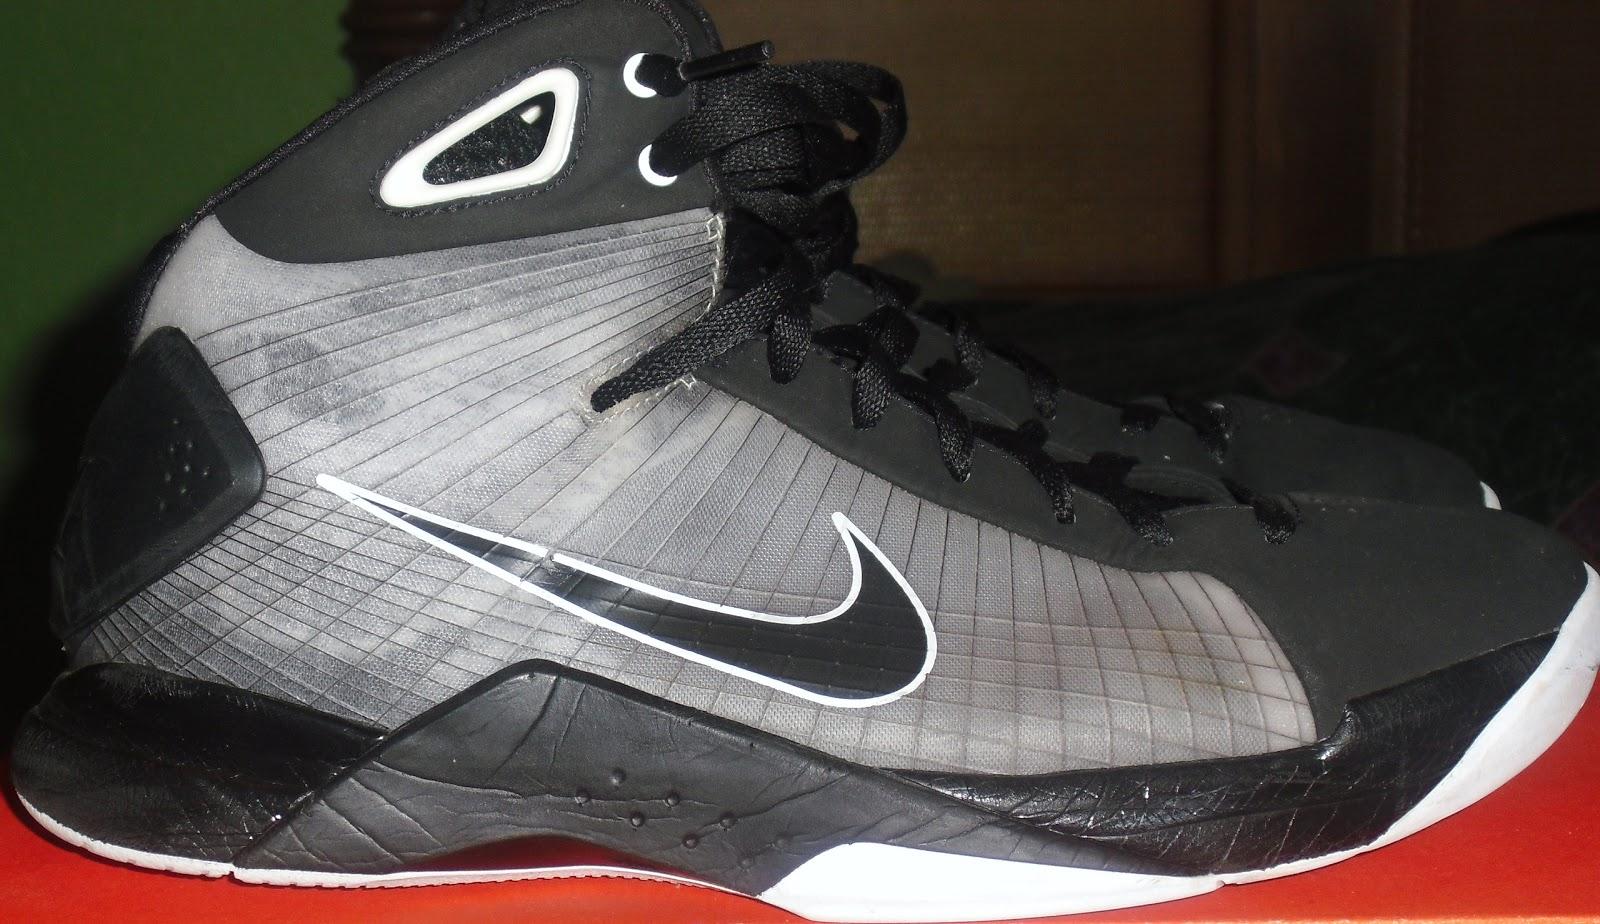 size 40 aedc4 5f74e Hyper Dunking (Nike Hyperdunk high)